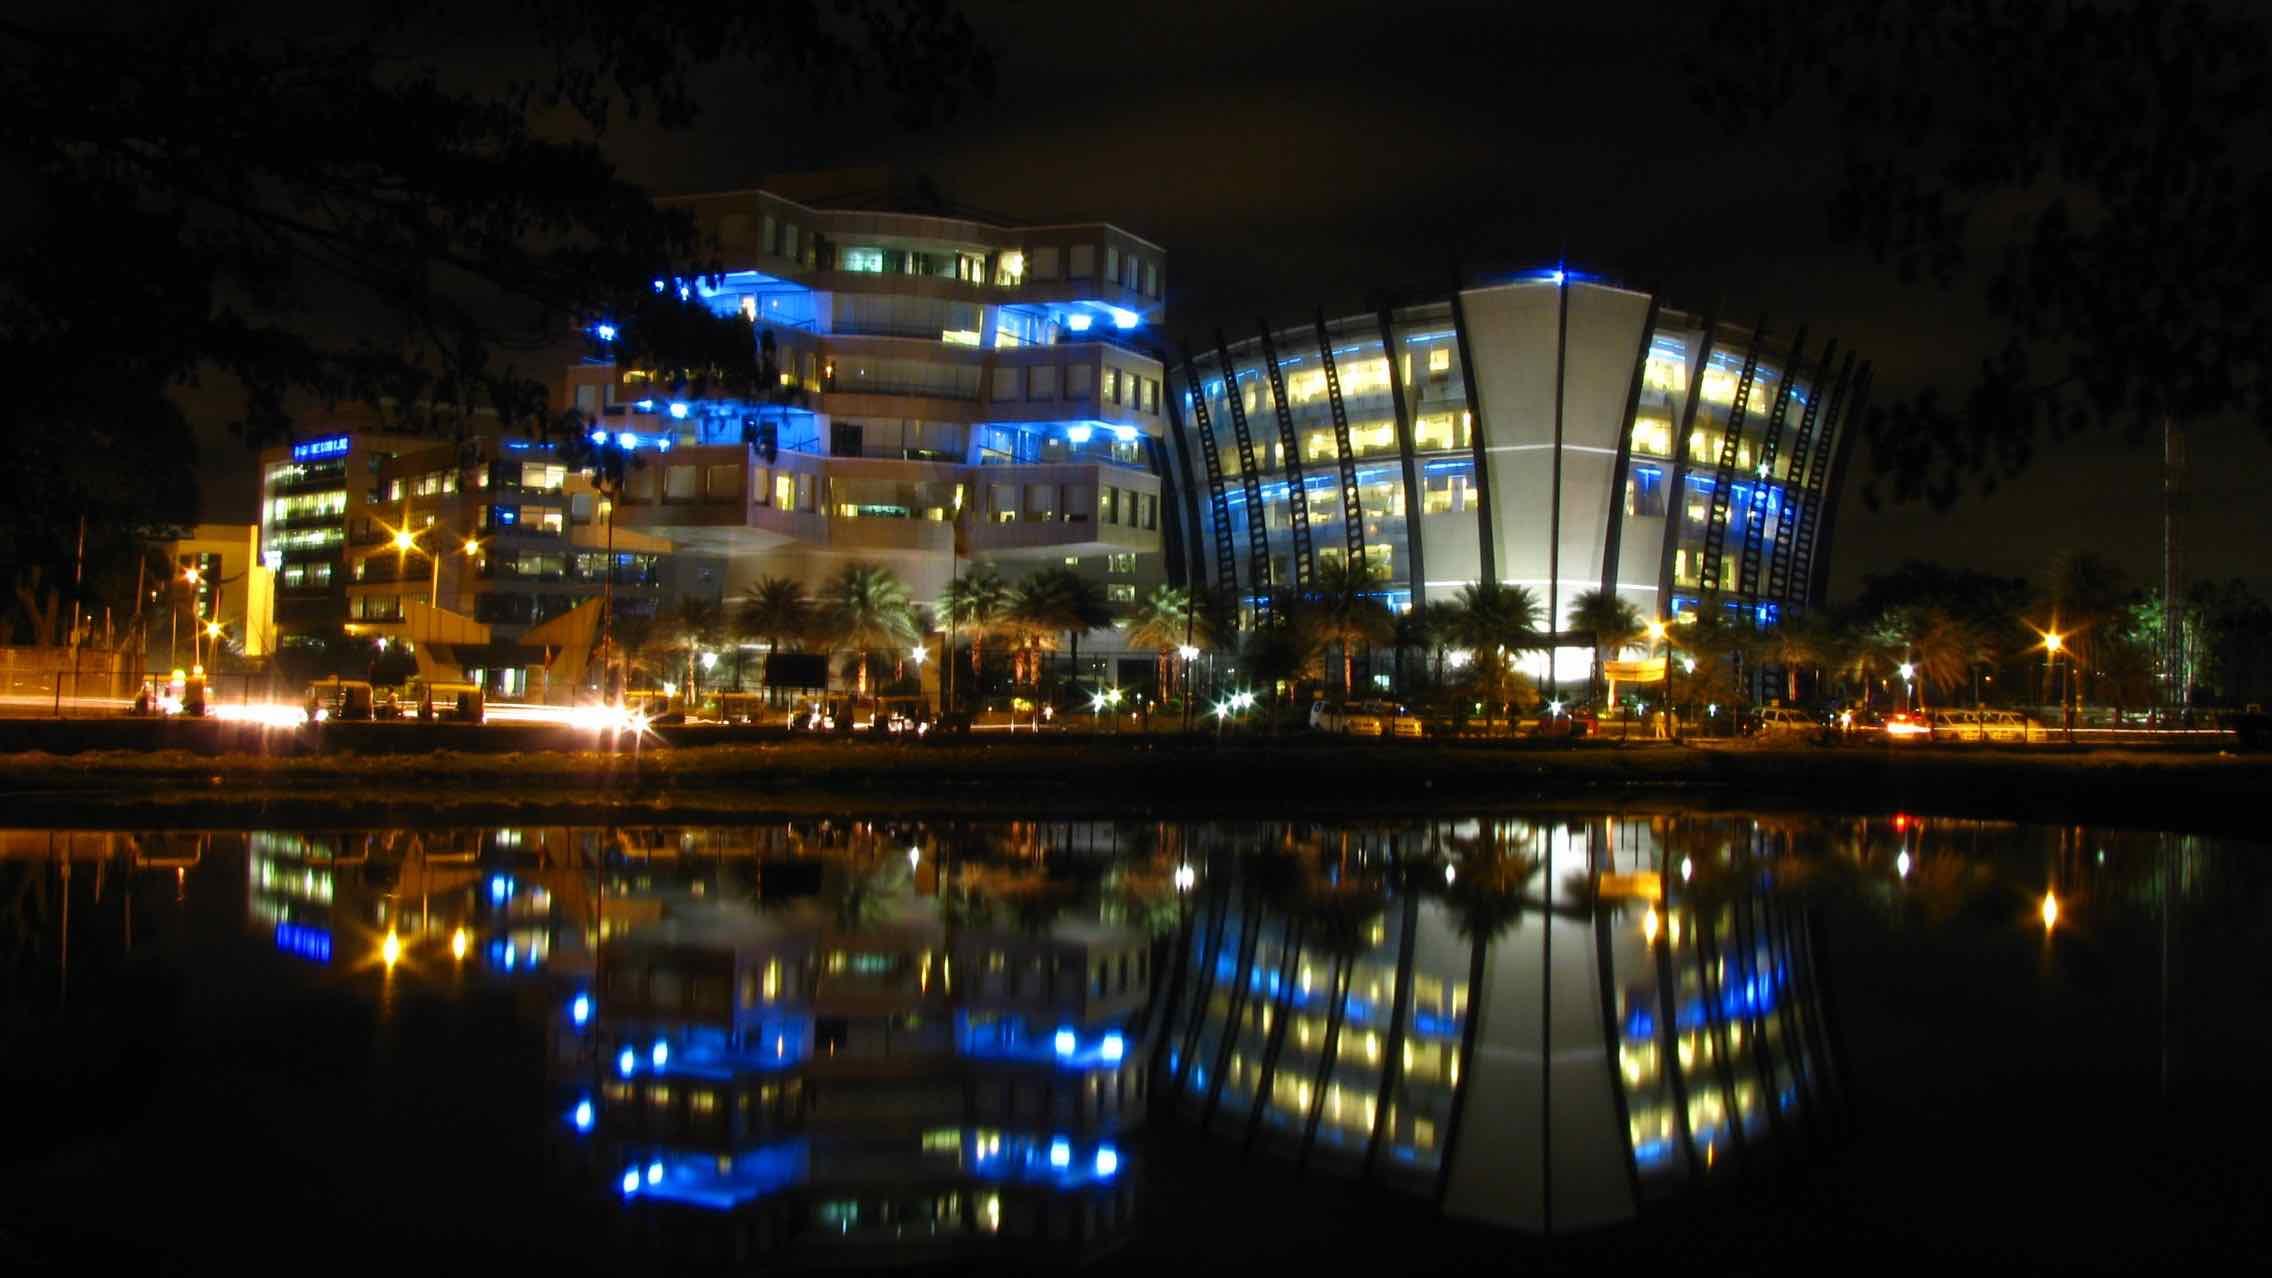 Bagmane_Tech_Park_Bangalore_India.jpg